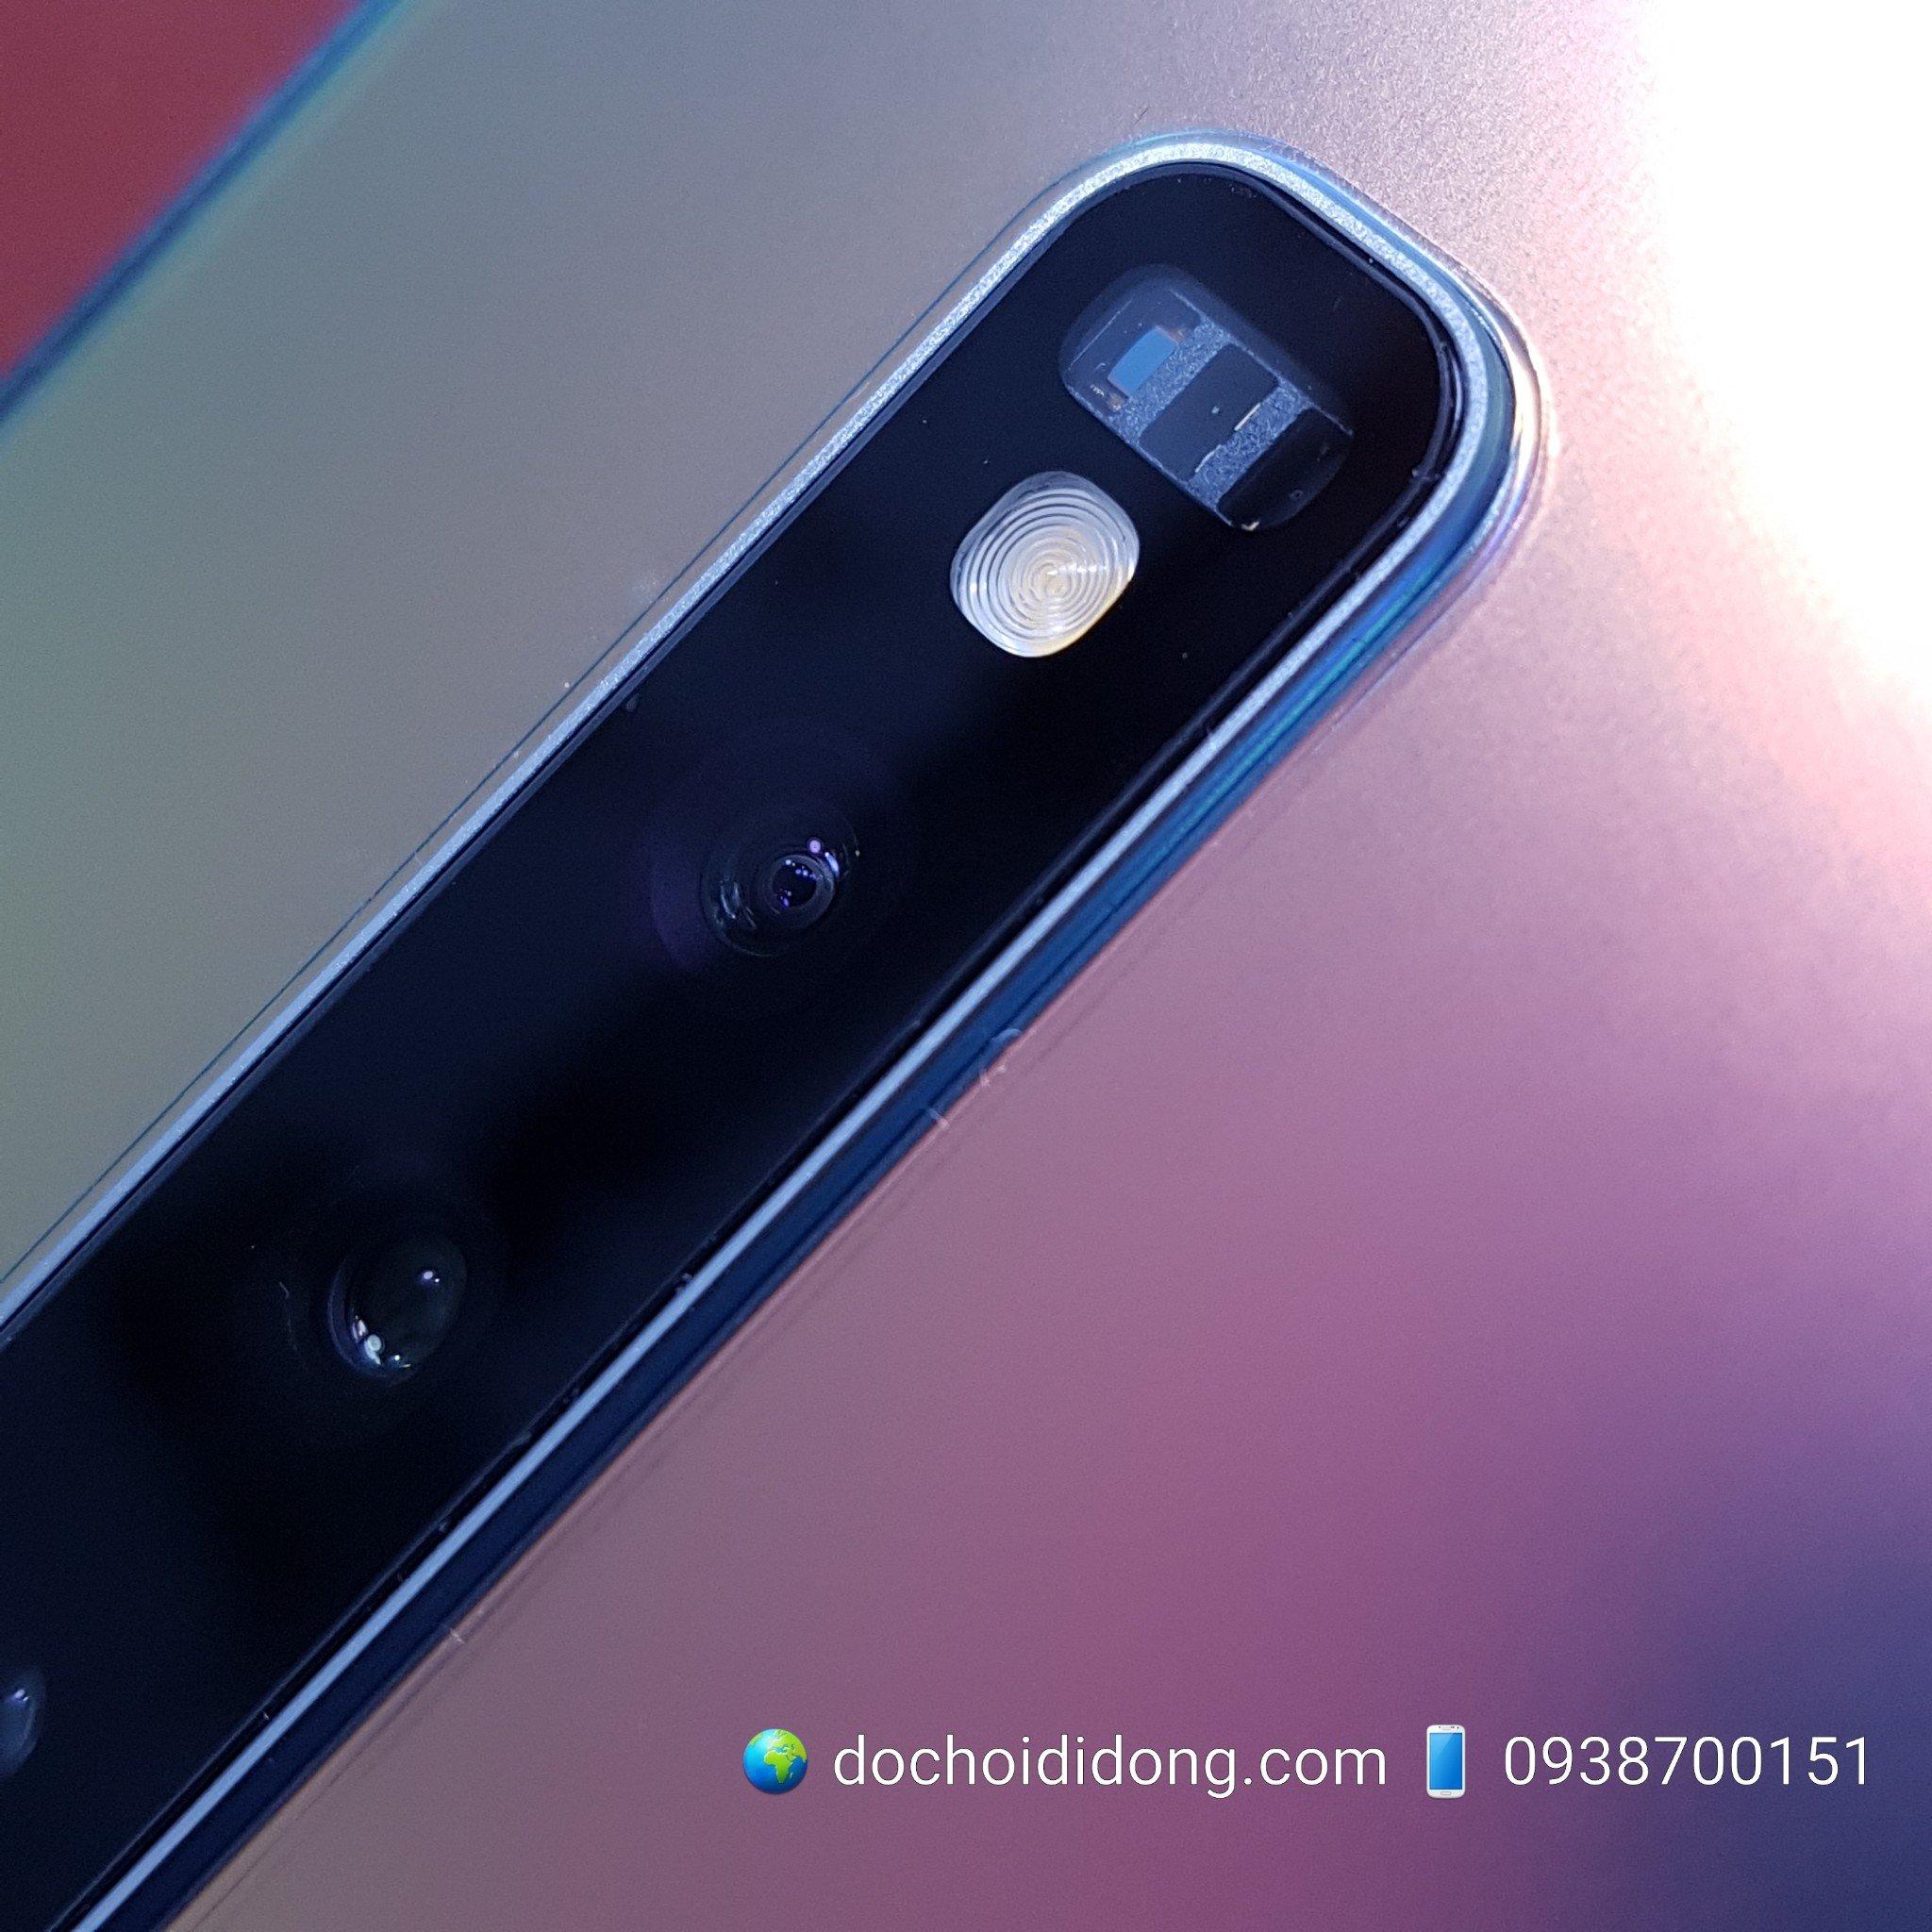 cuong-luc-camera-sau-samsung-s10-s10-plus-9h